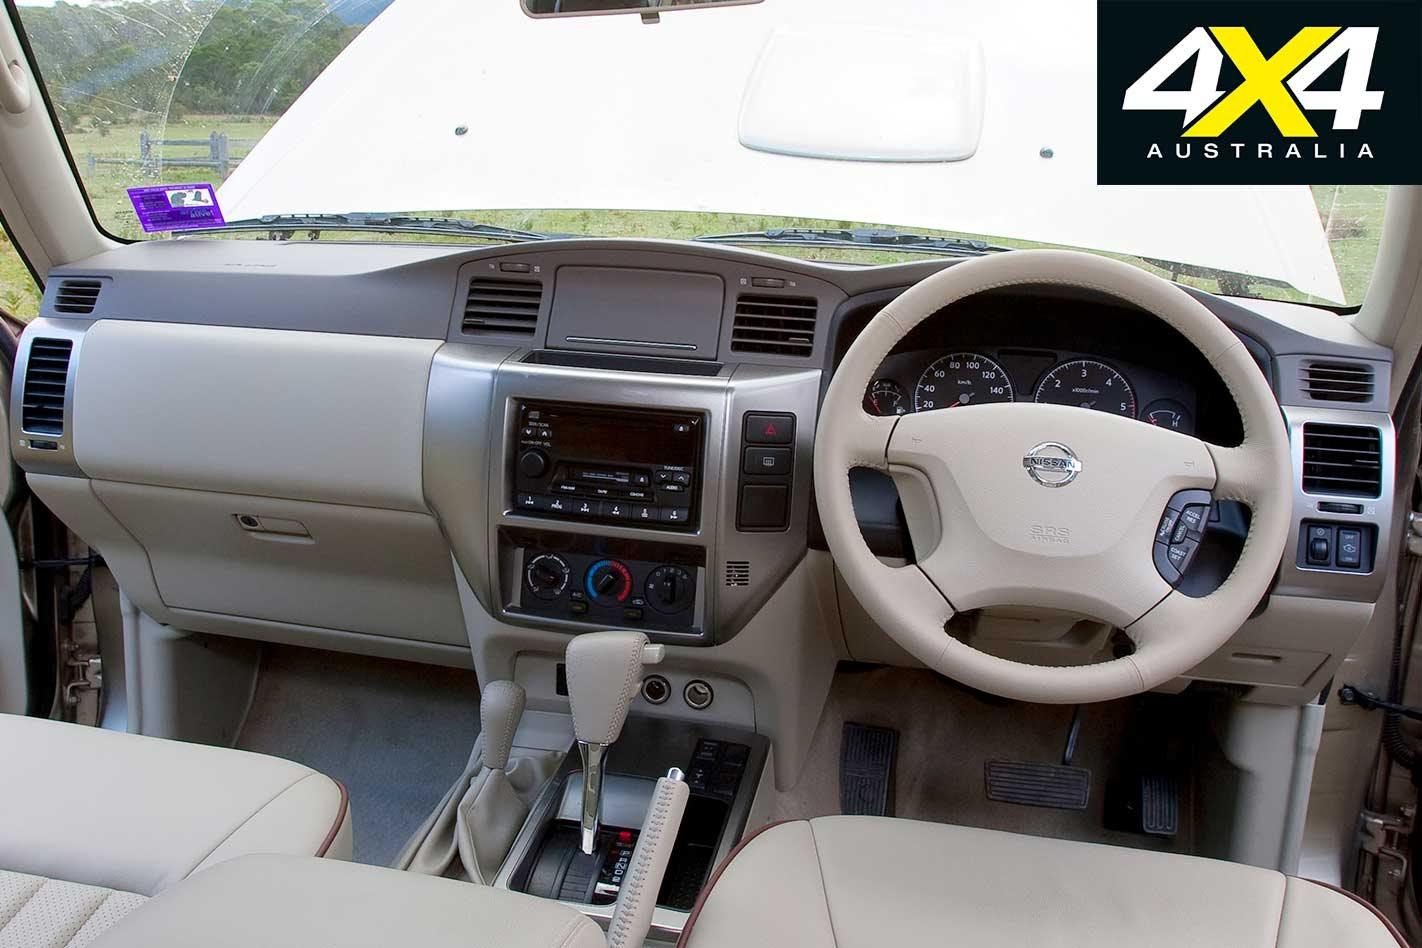 2009 Land Rover Defender vs Nissan Patrol vs Toyota